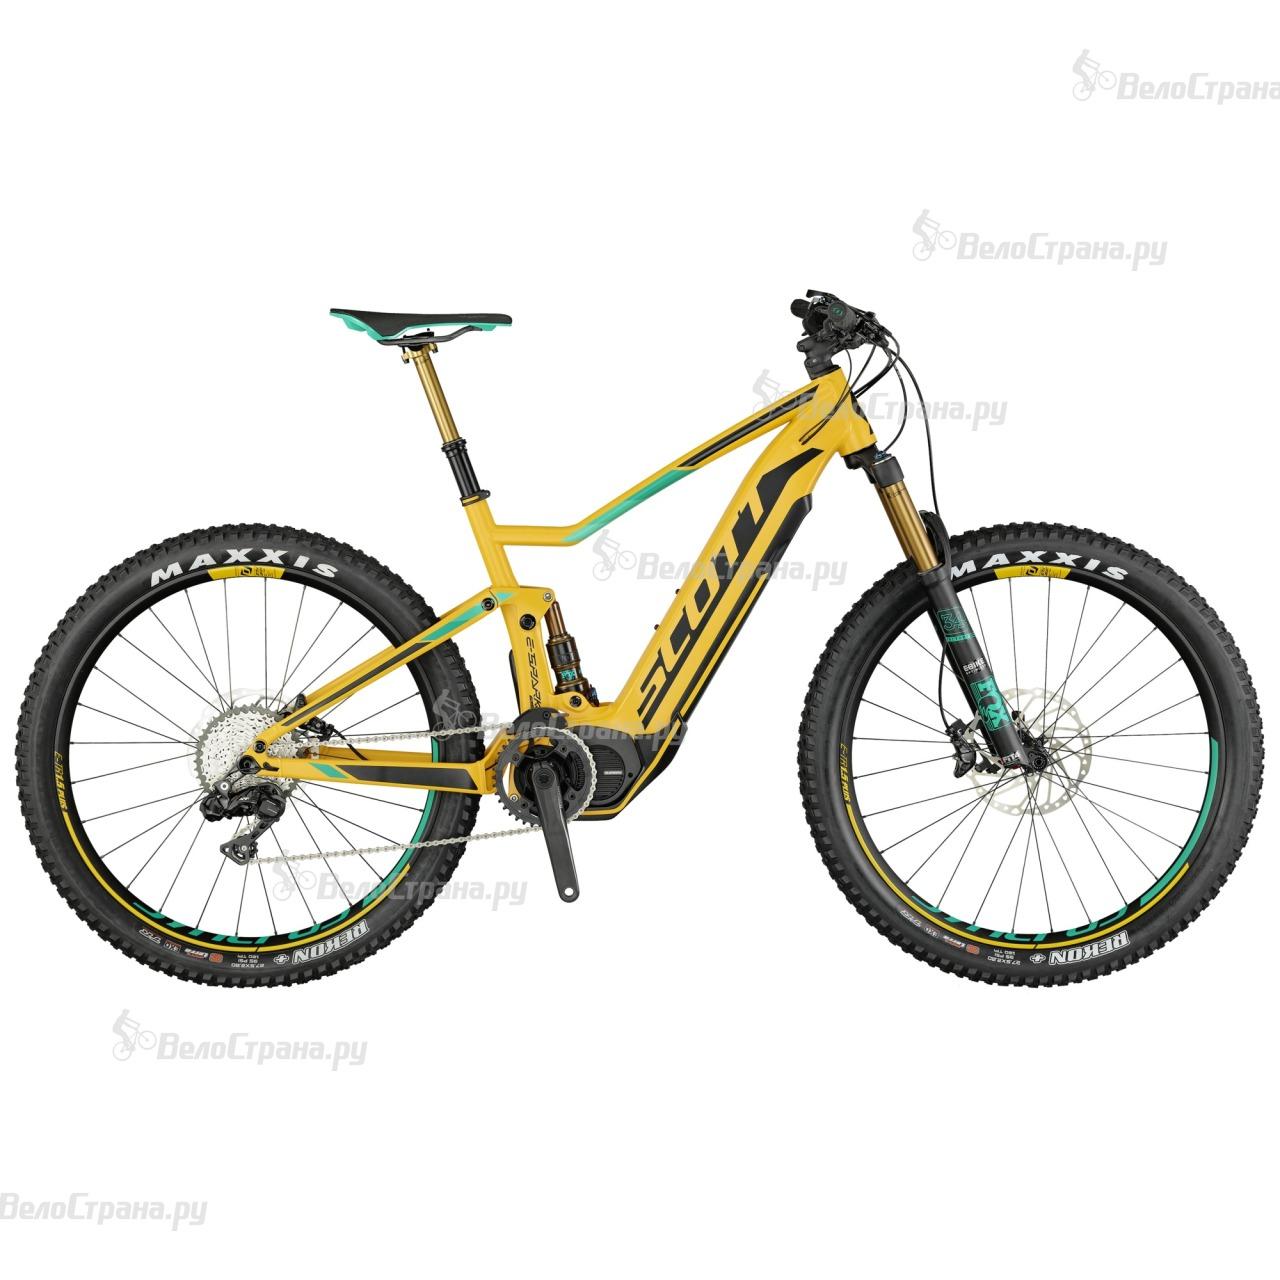 Велосипед Scott E-Spark 700 Plus Tuned (2017) велосипед scott genius lt 700 tuned plus 2016